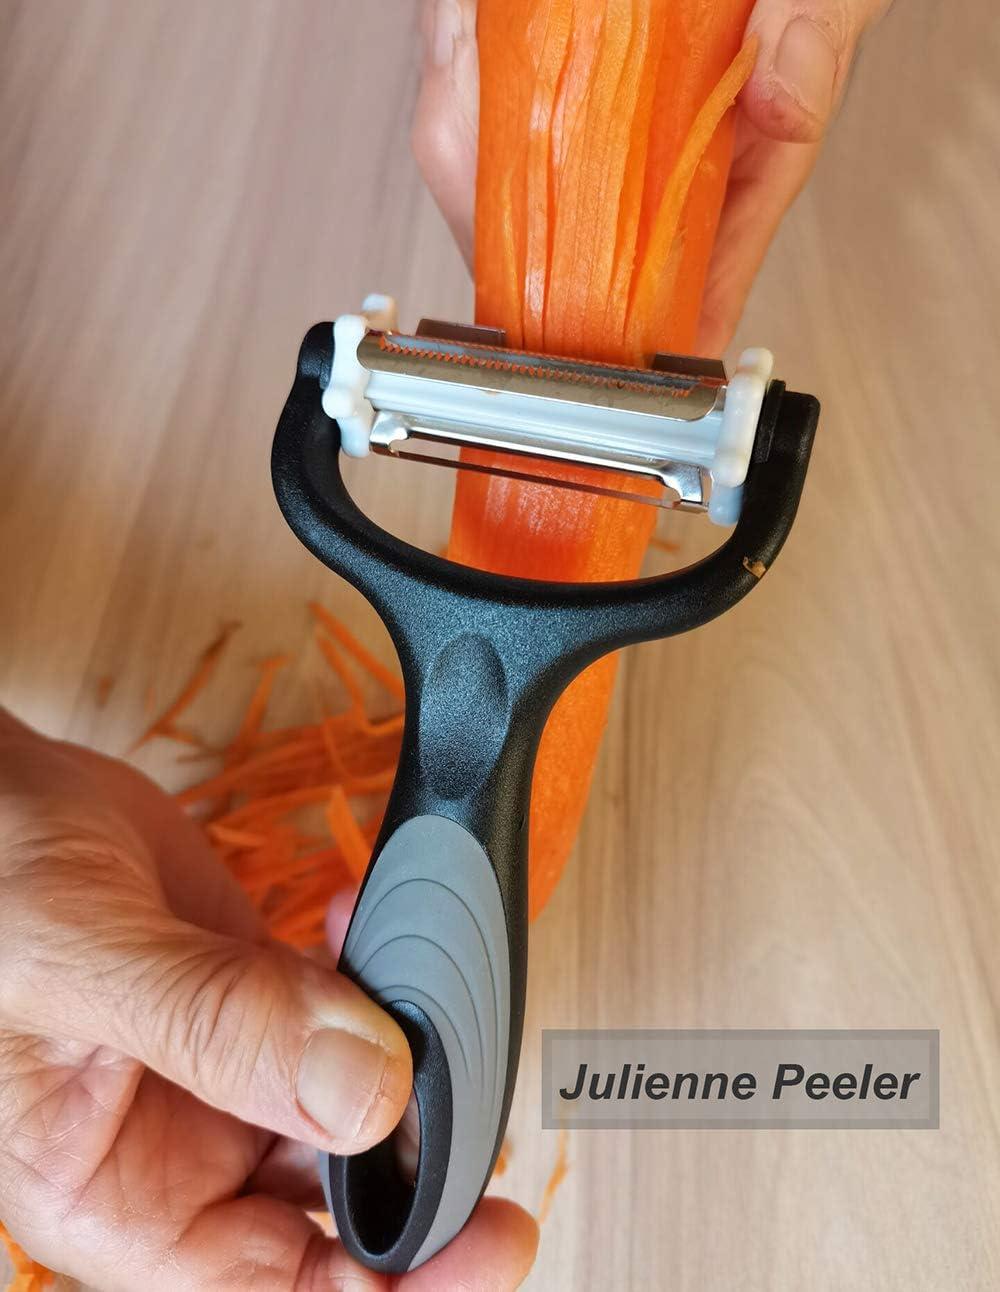 Y Peeler,Serrated Peeler/&Julienne Peeler ,Premium Stainless Steel Peelers for Veggie,Carrot,Fruit. YUSENONA 3-in-1 Multipurpose Peelers for Kitchen Potato Peelers,Veggie Peeler /& Fruit peeler